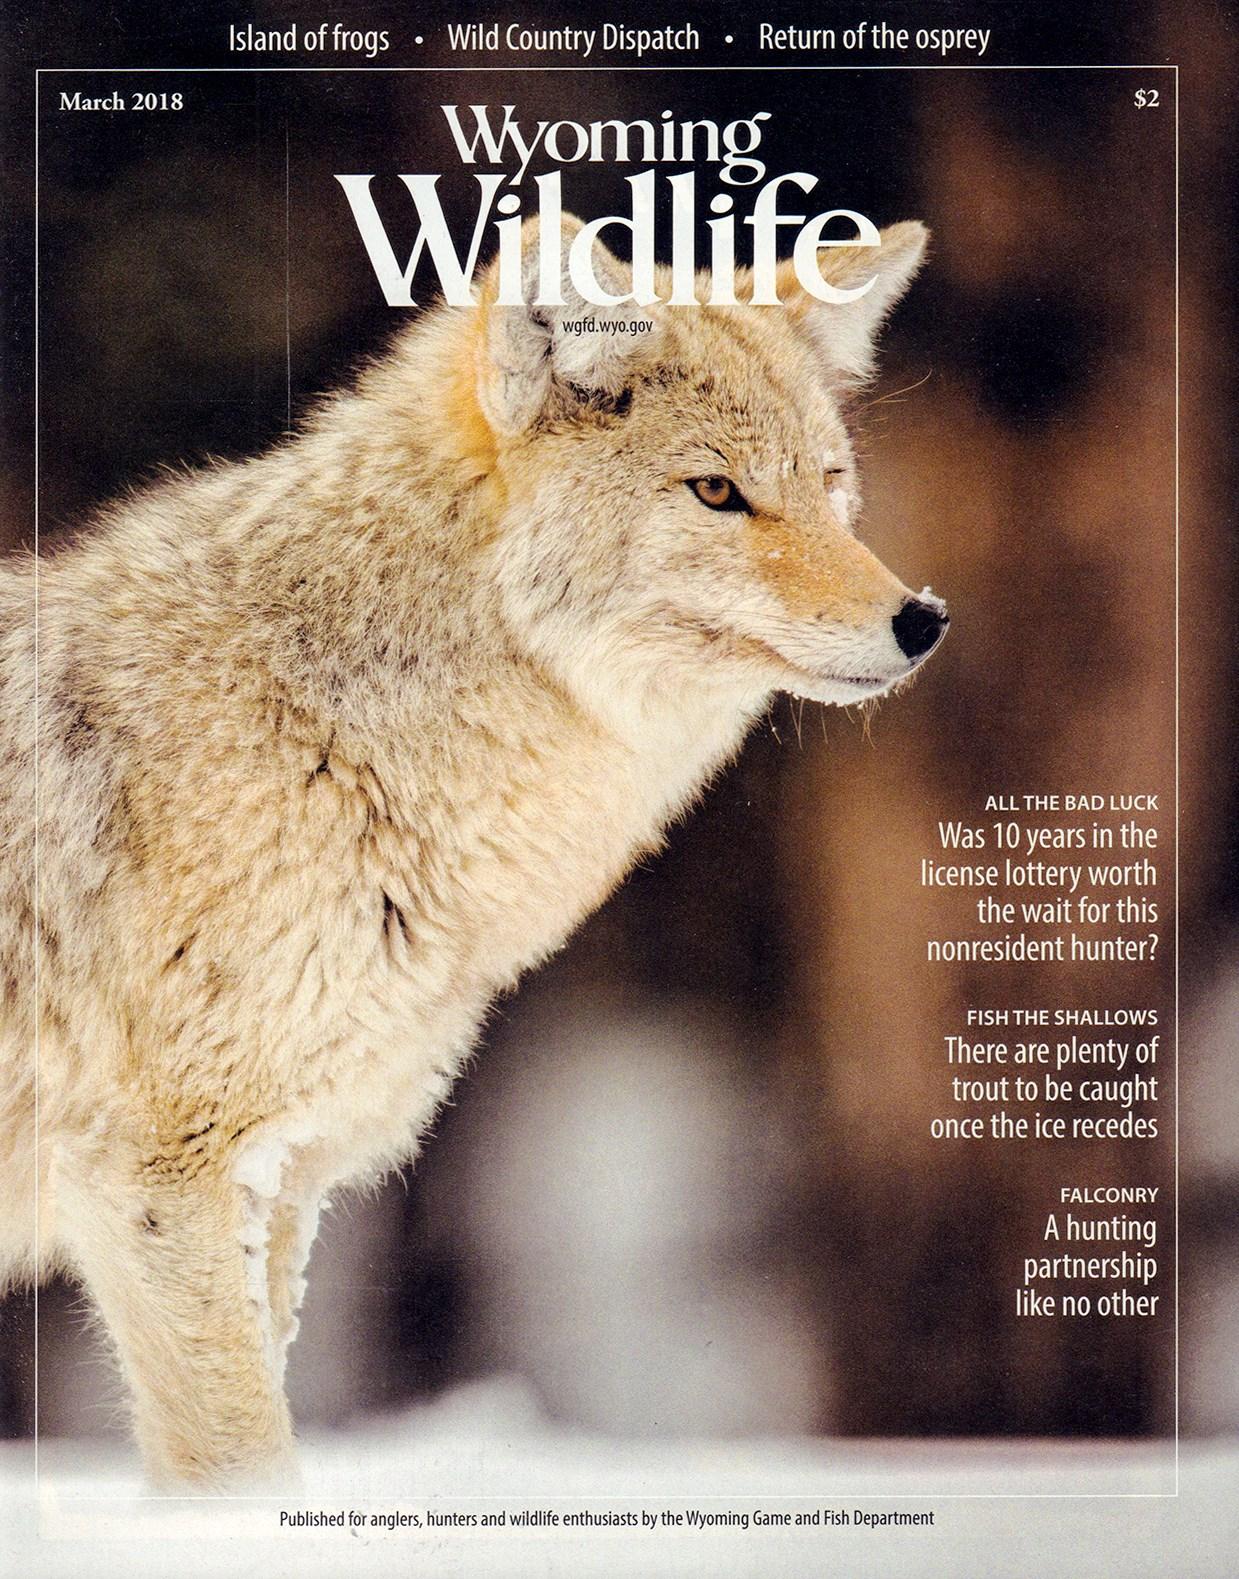 Wyoming Wildlife Print Magazine Infonet Systems Inc. Unique ...